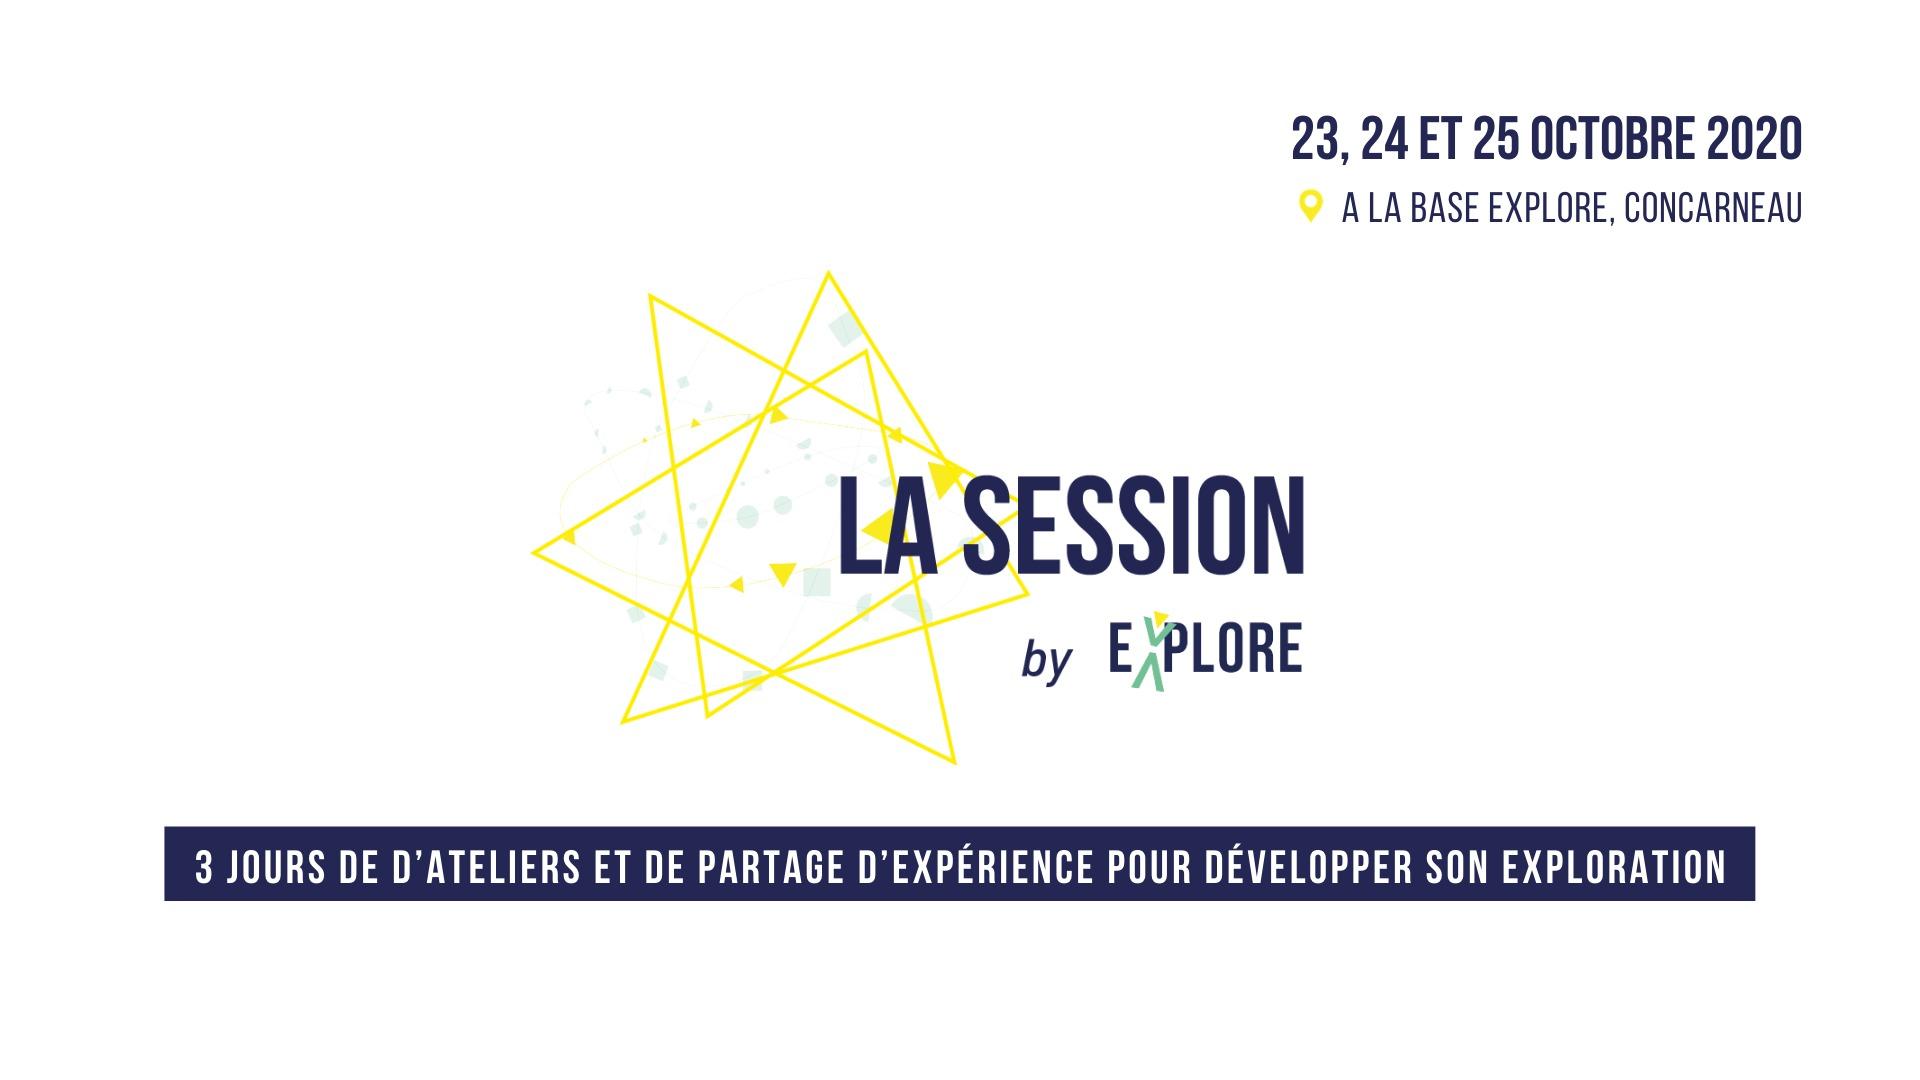 la session by explore